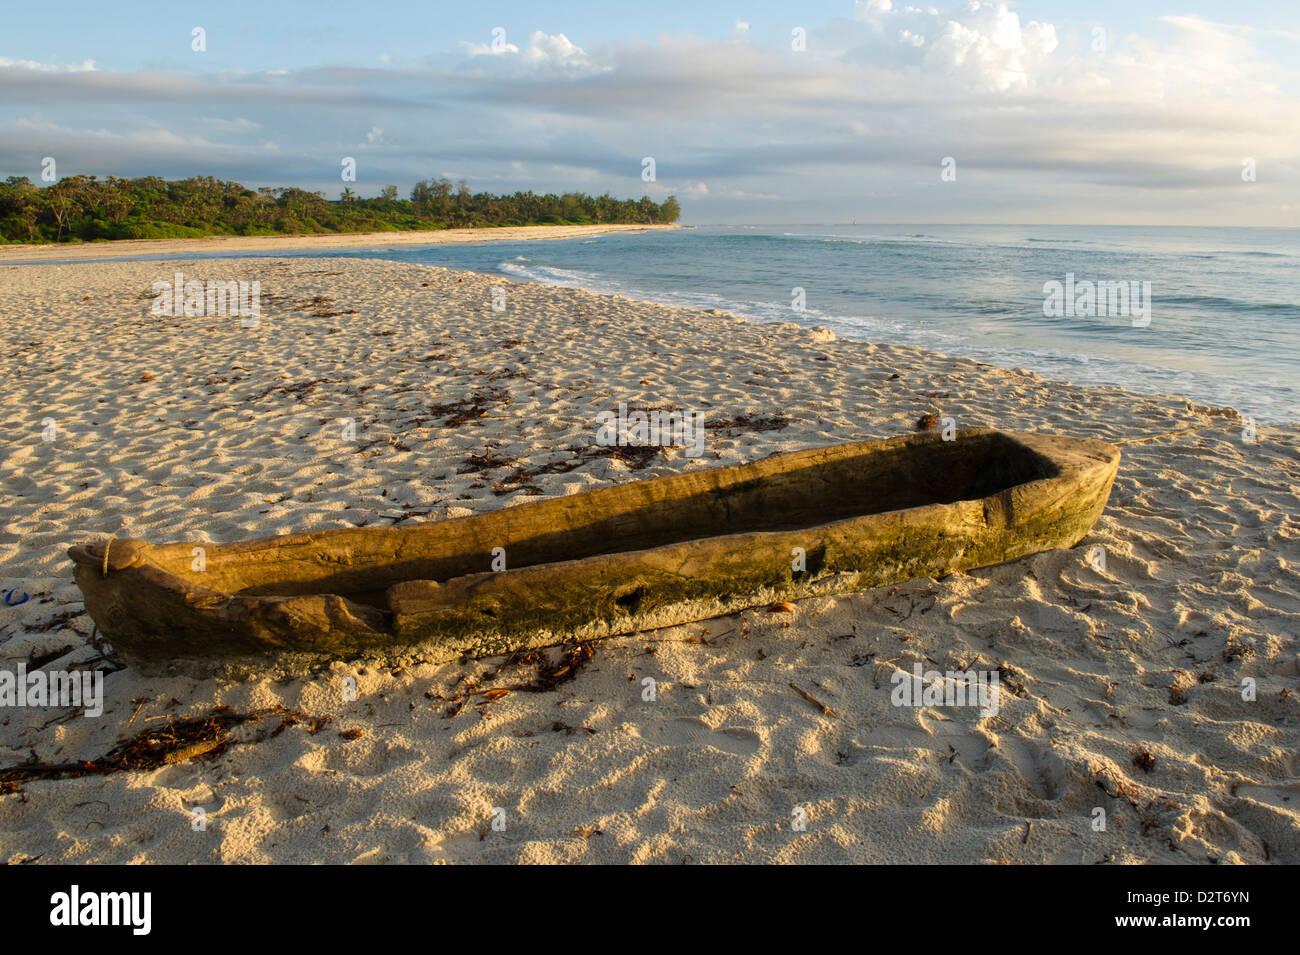 Dugout canoe, Diani Beach, Kenya - Stock Image